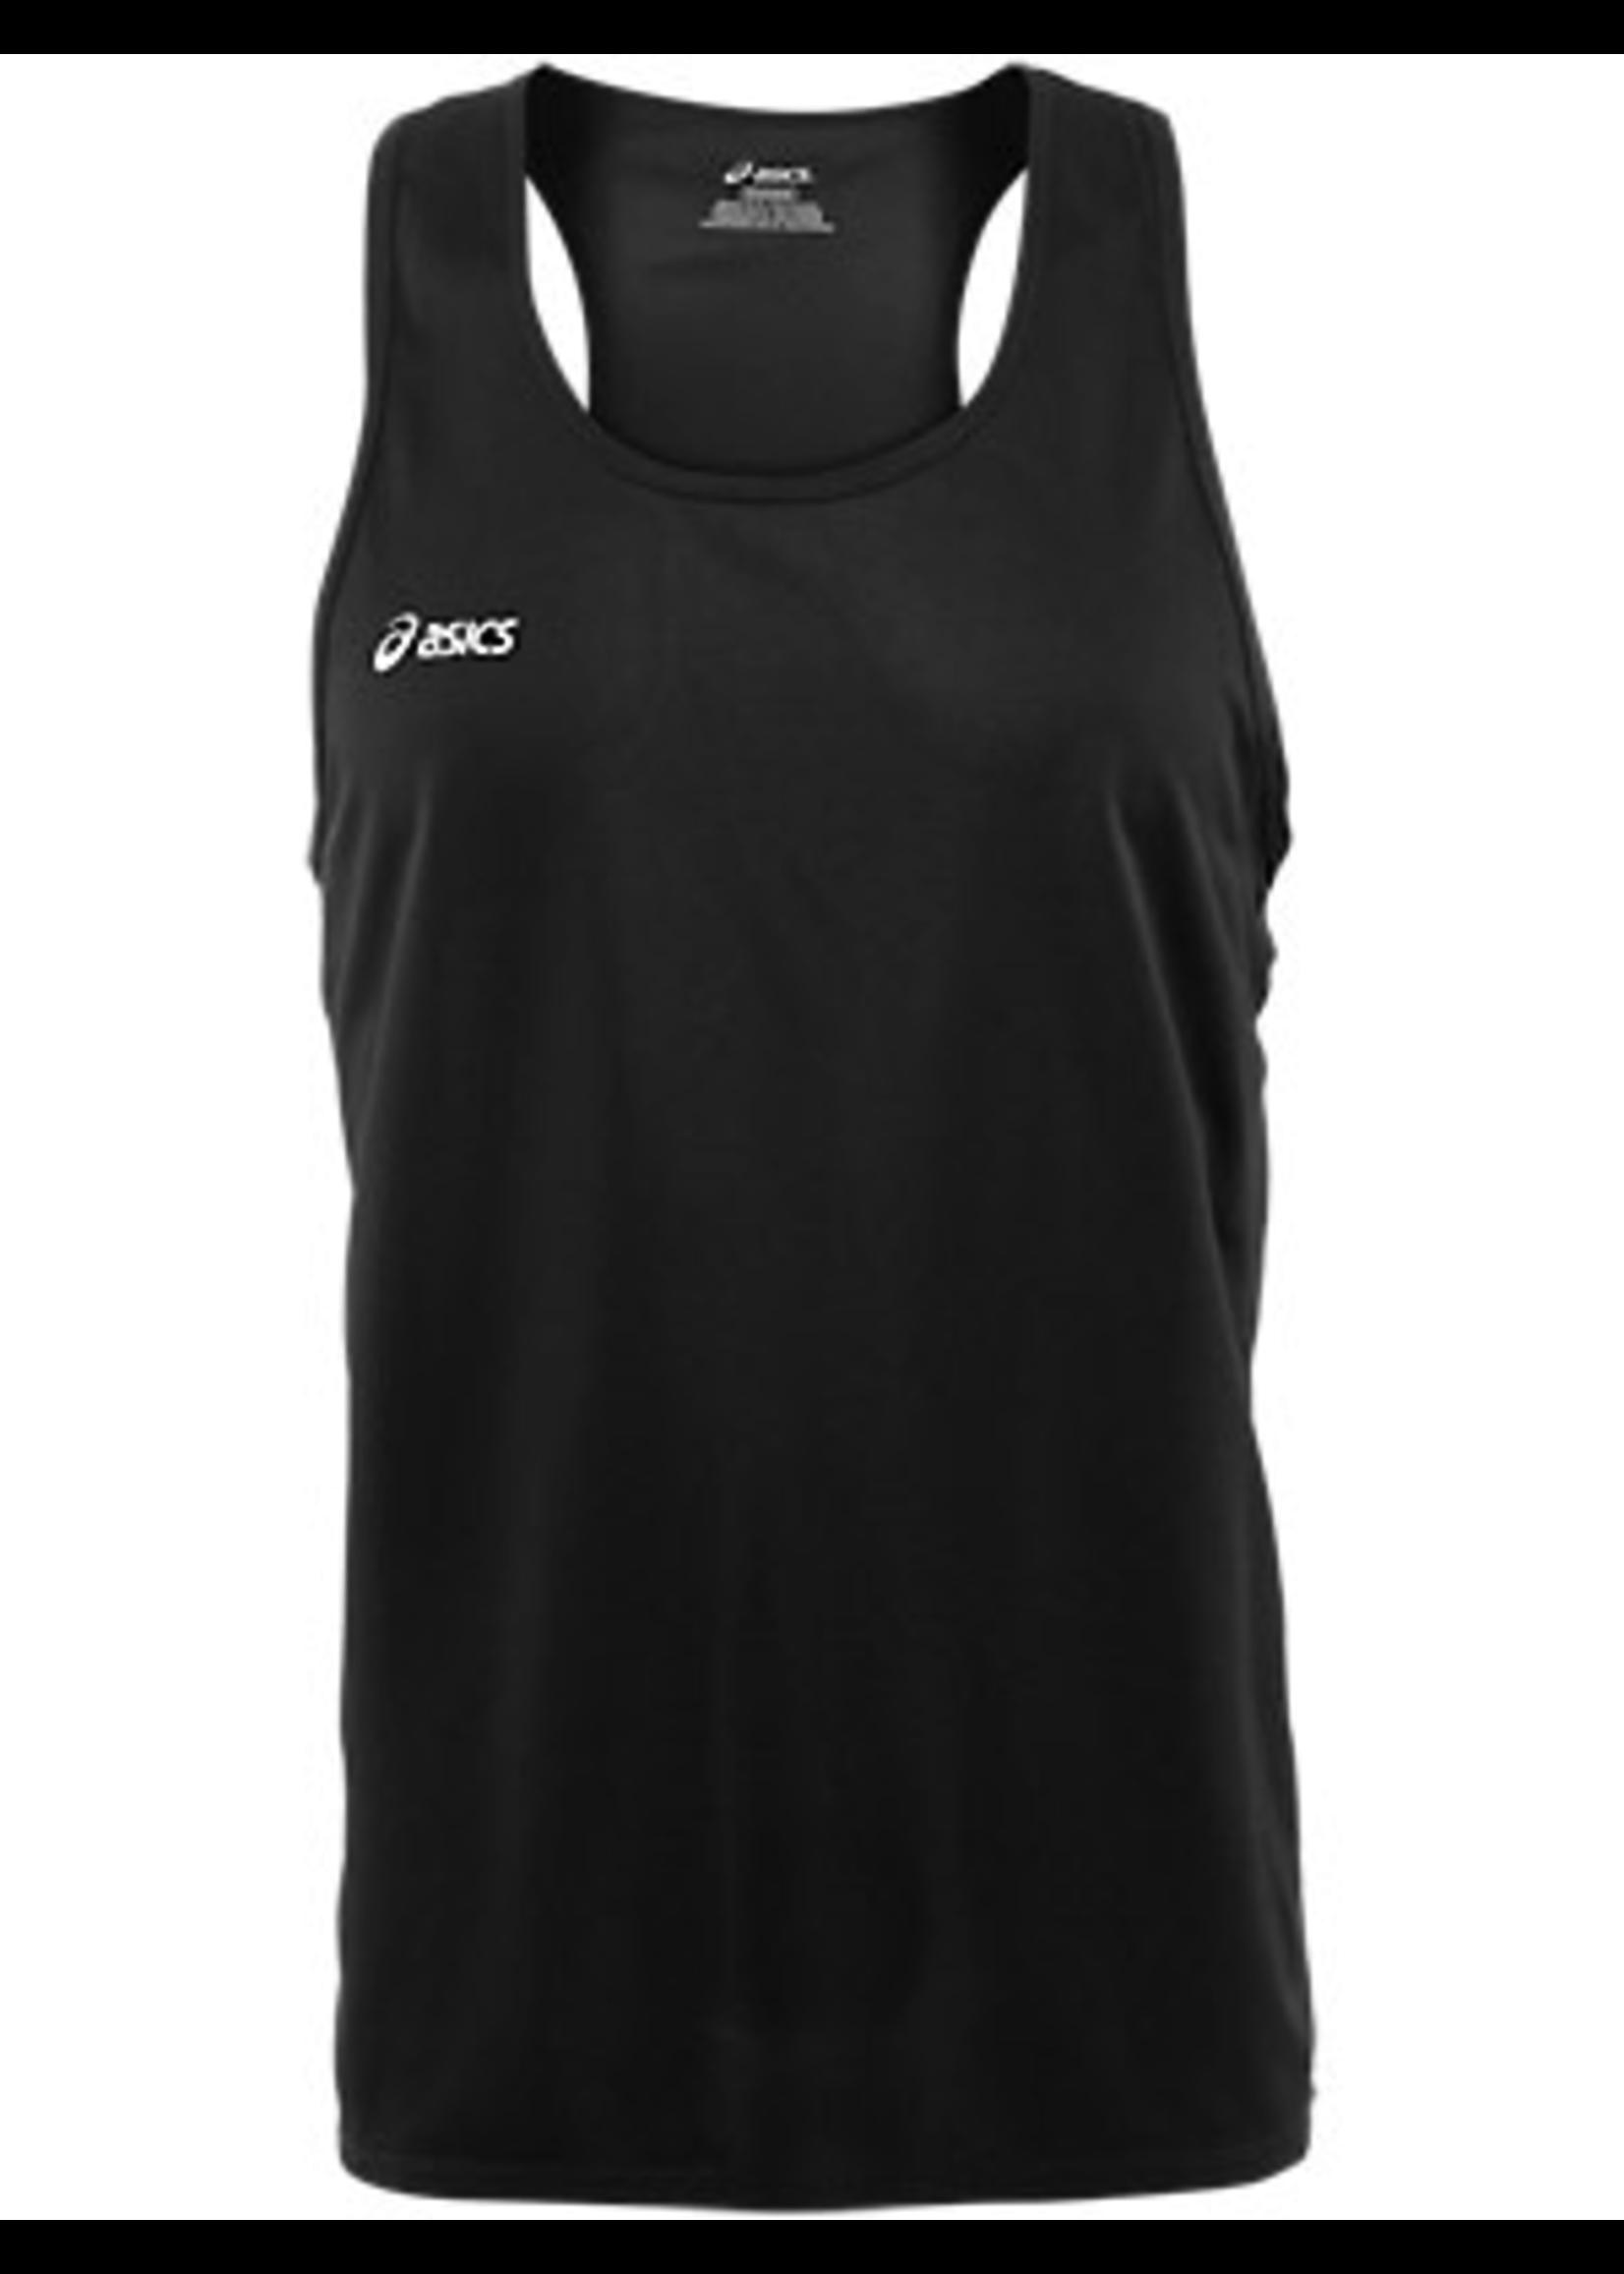 Asics Asics Mens singlet vest black XL